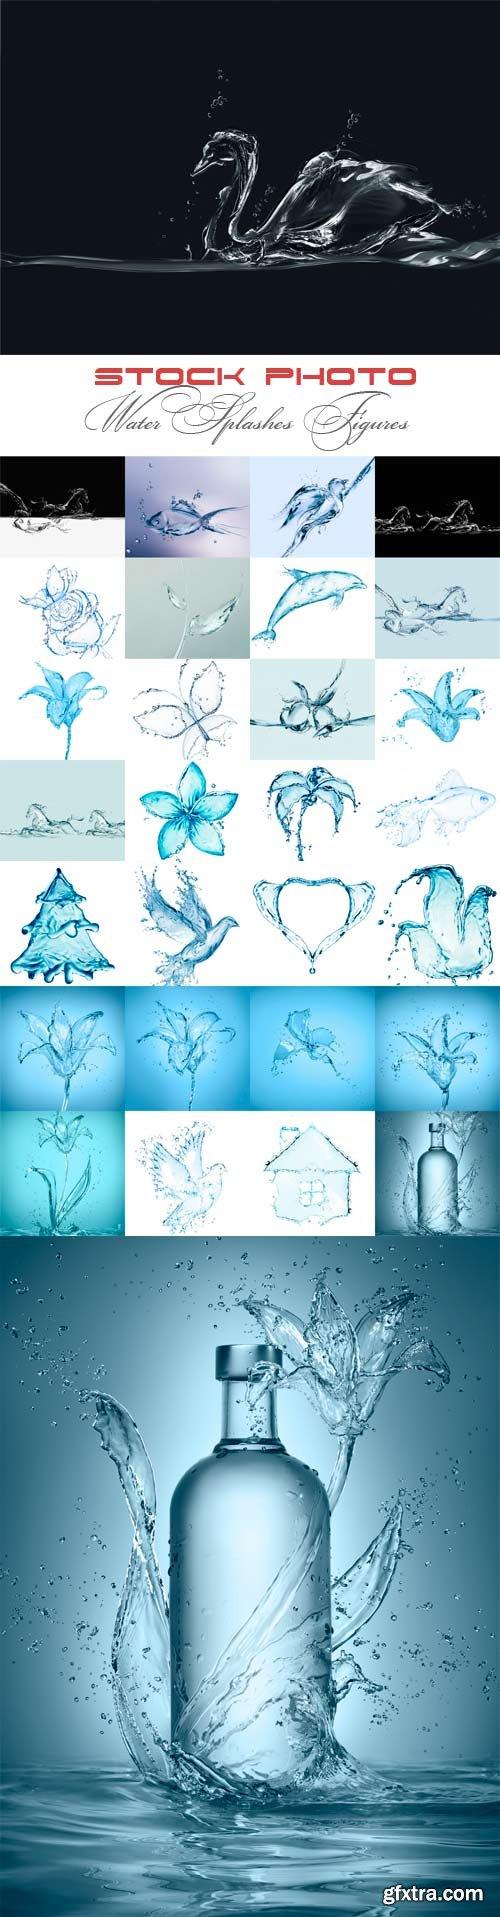 Water splashes figures raster graphics